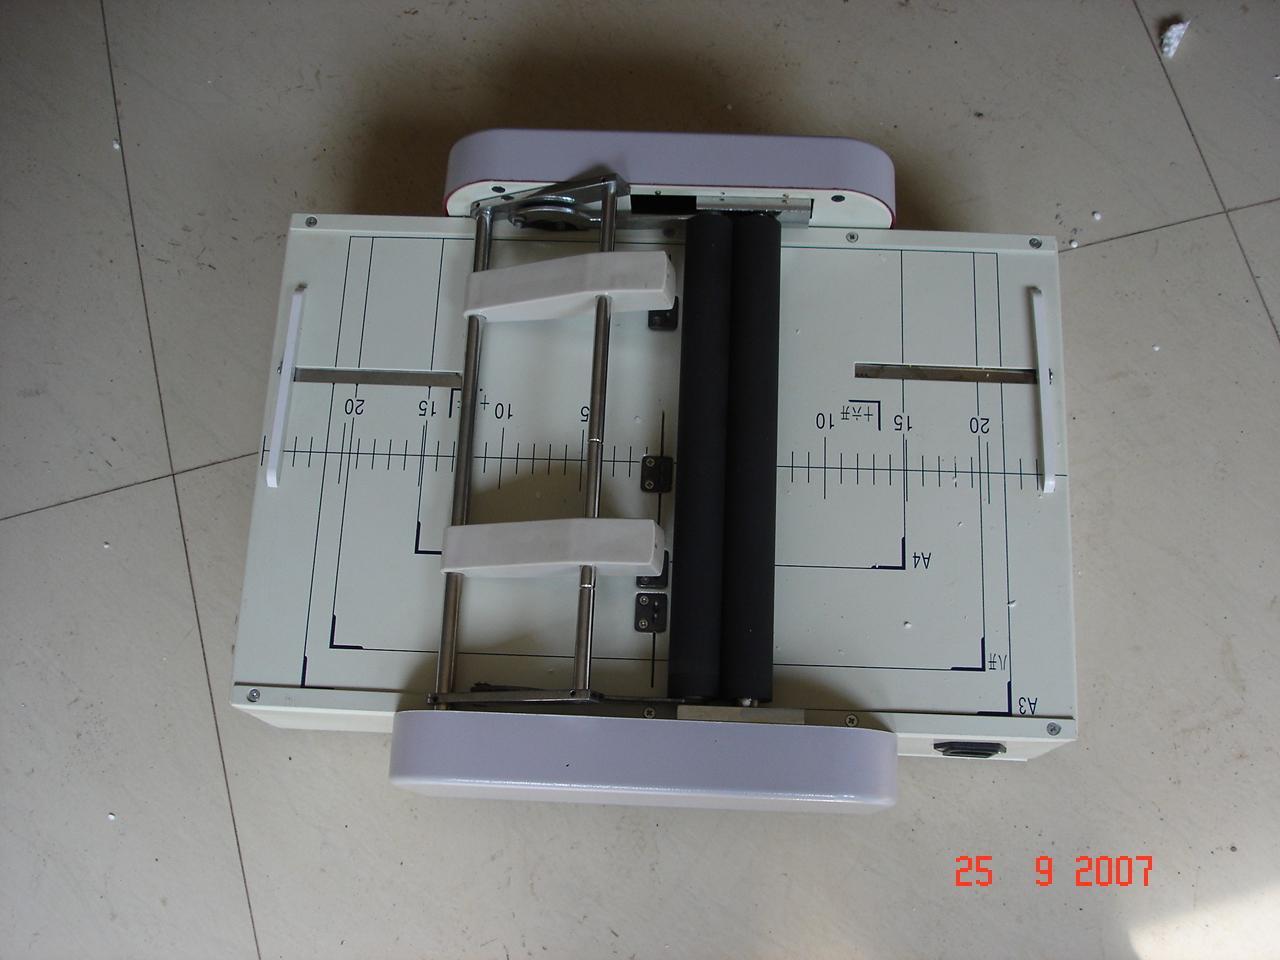 folding and stapling machine